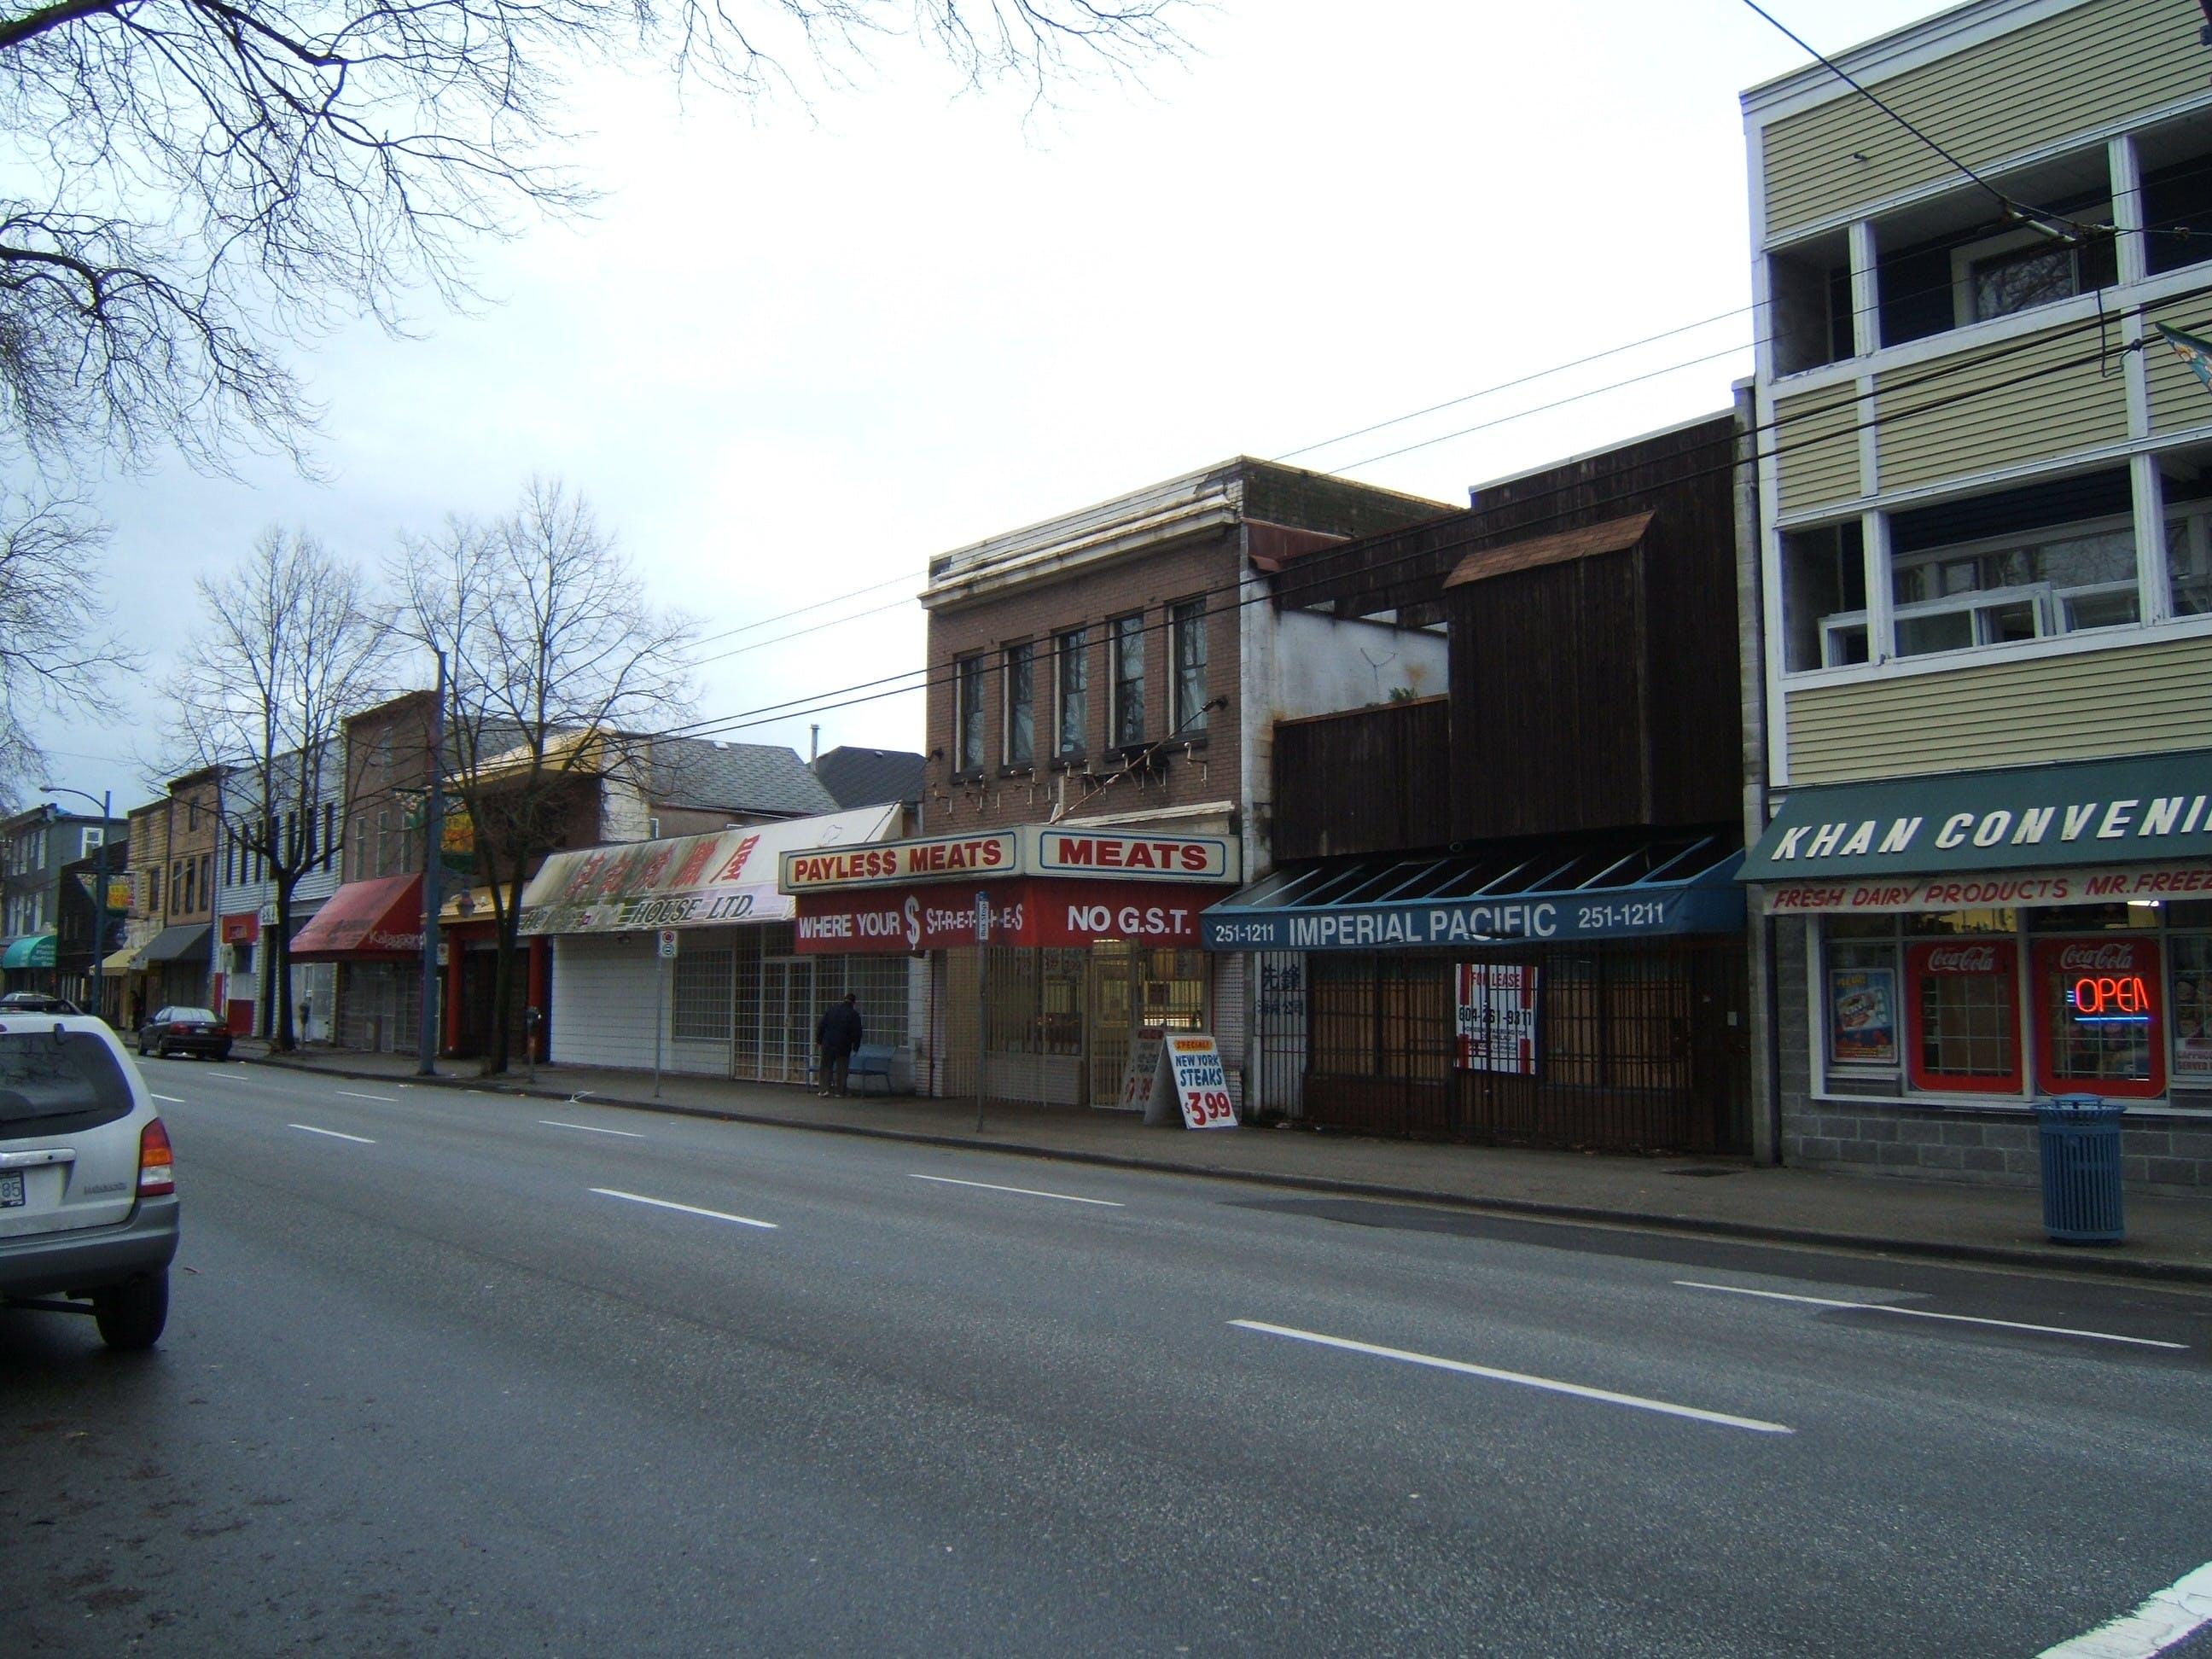 400 Powell Streetscape.JPG